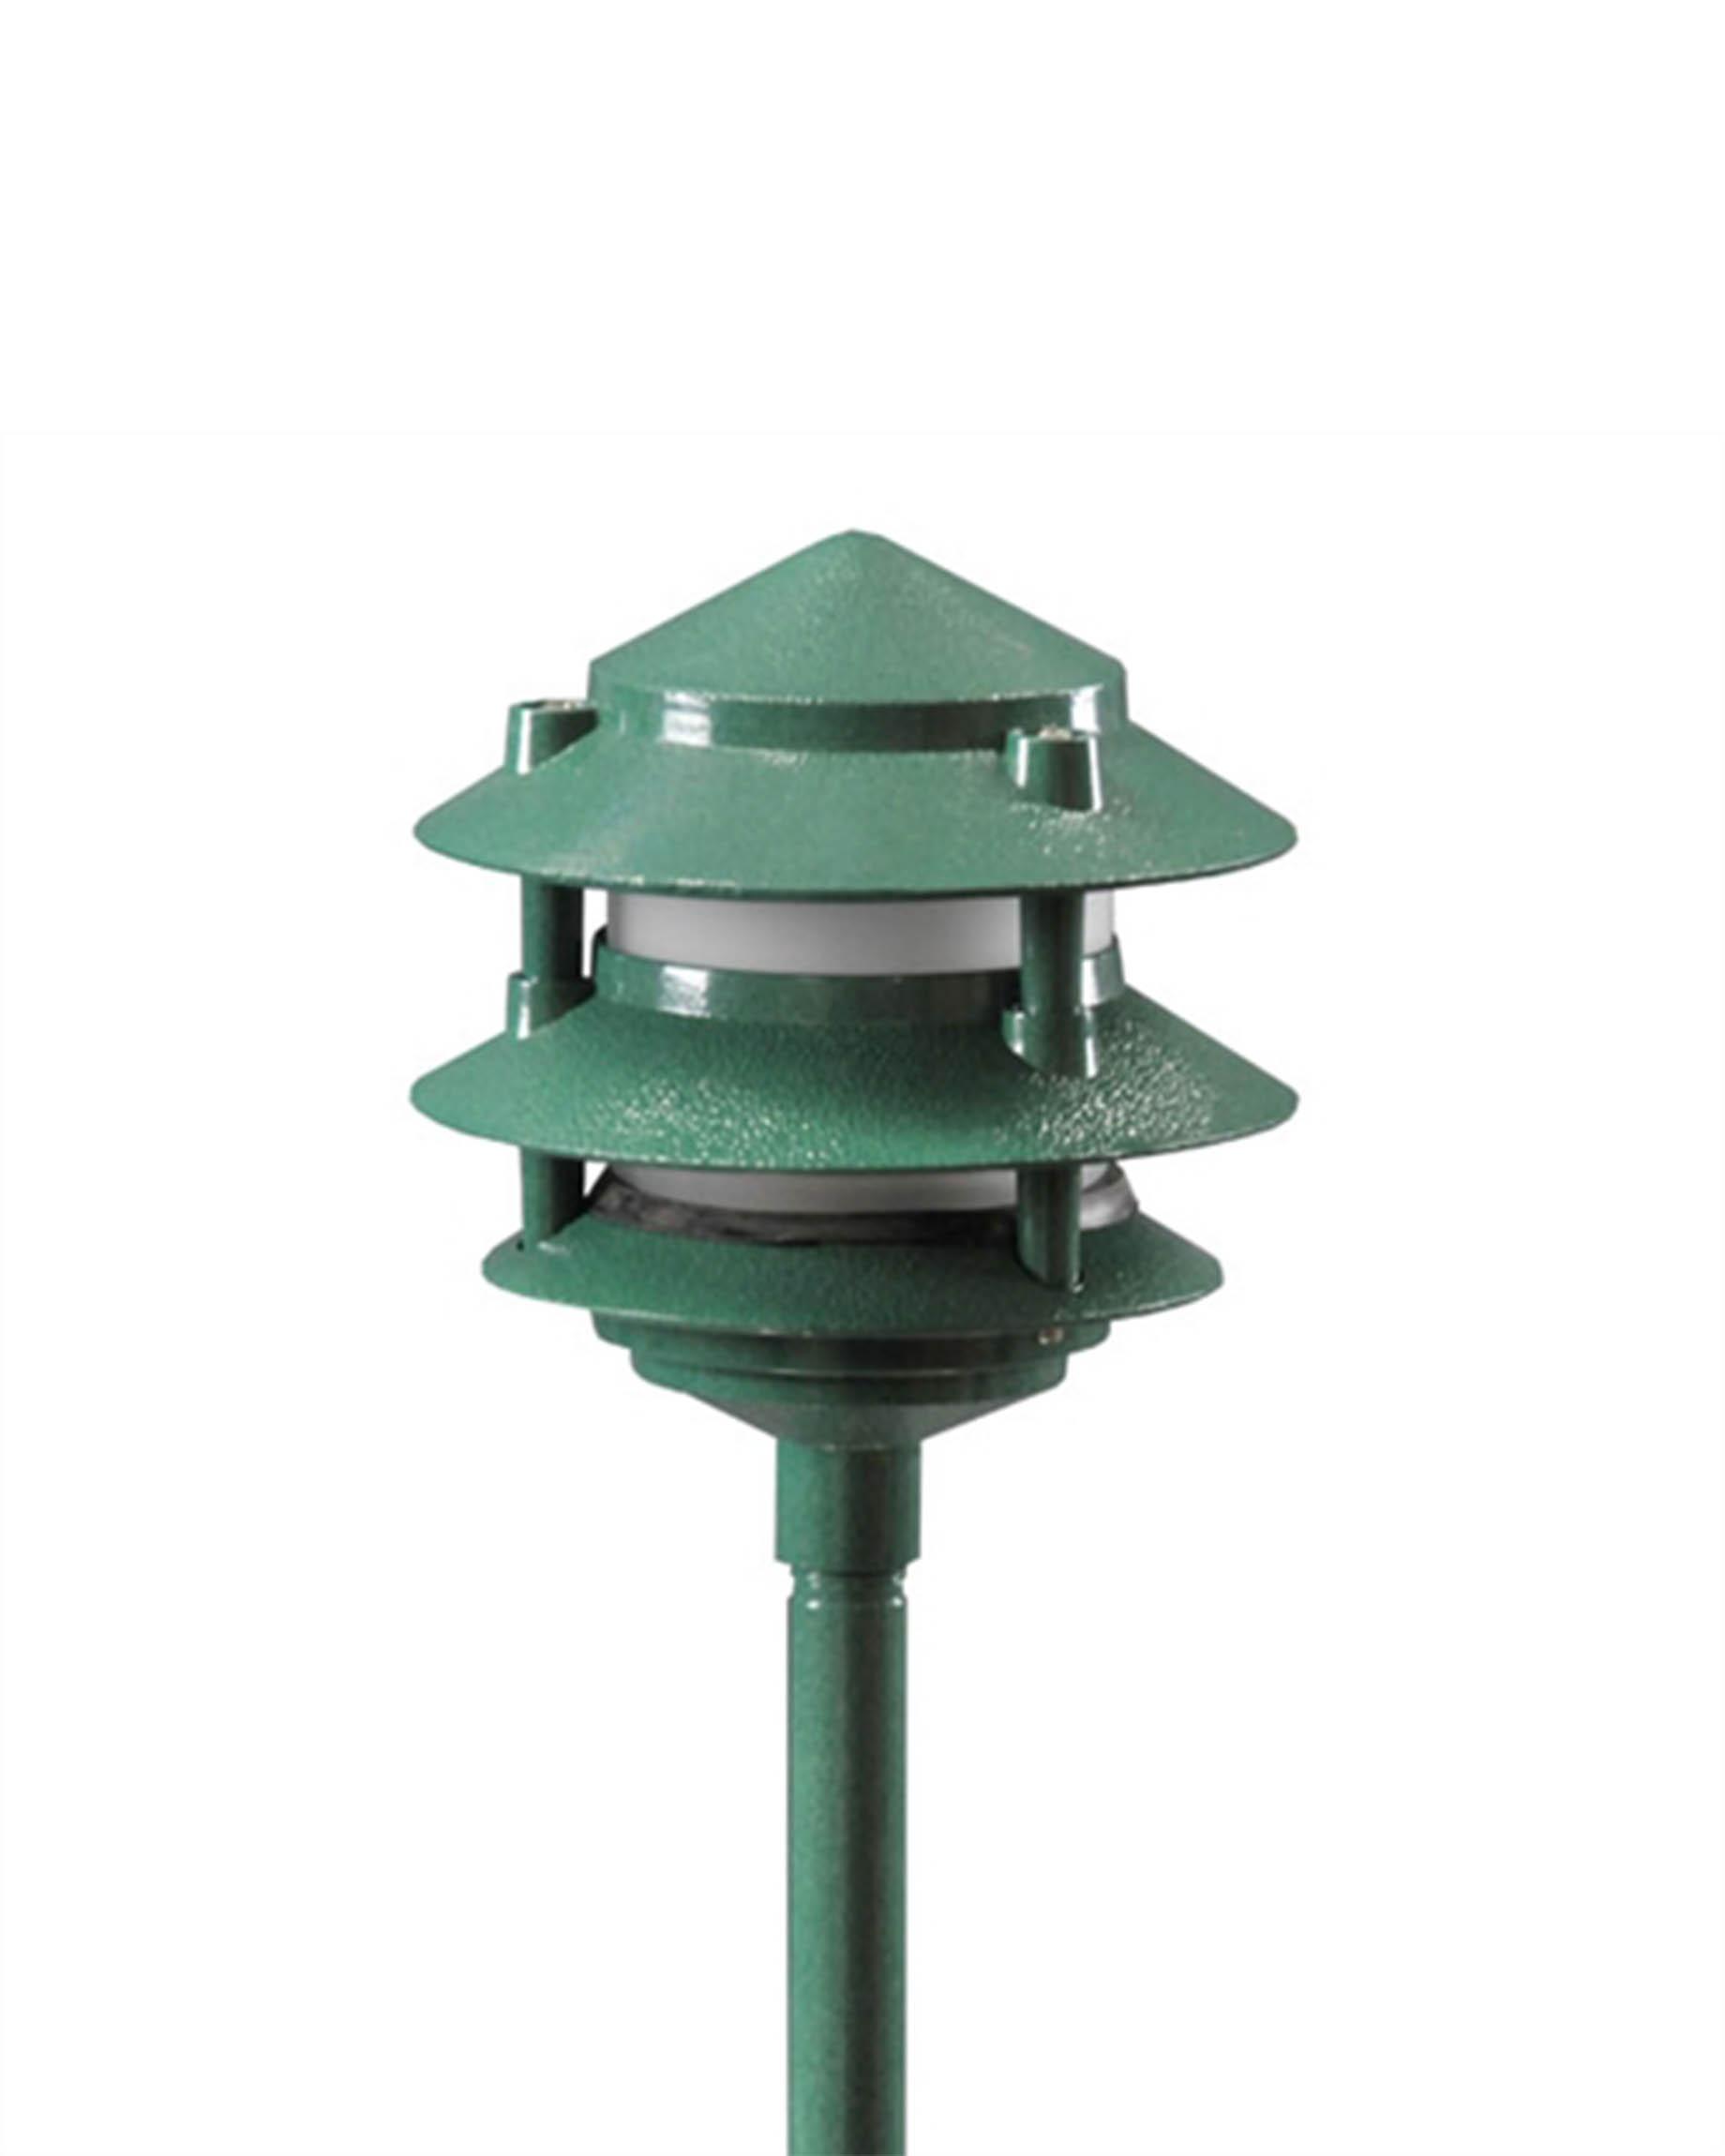 Orbit 12v green pagoda landscape light 50w max smart led aloadofball Image collections